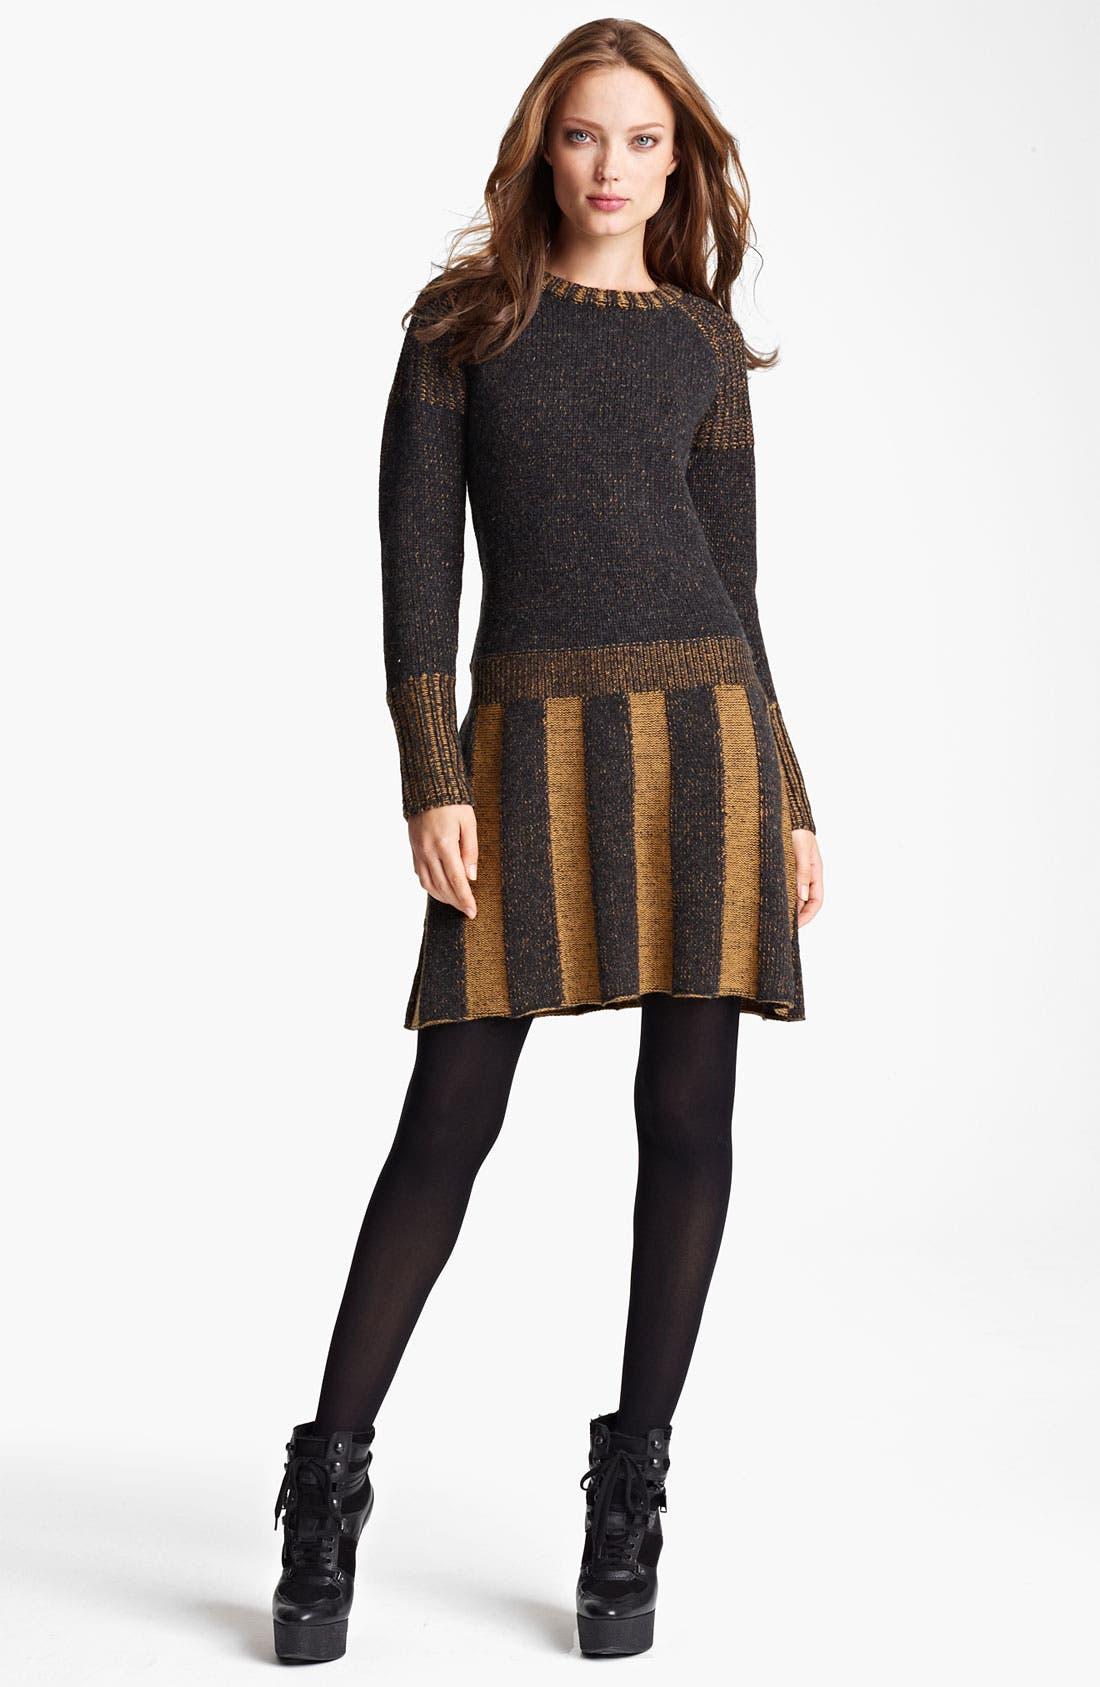 Main Image - Burberry Brit Drop Waist Sweater Dress